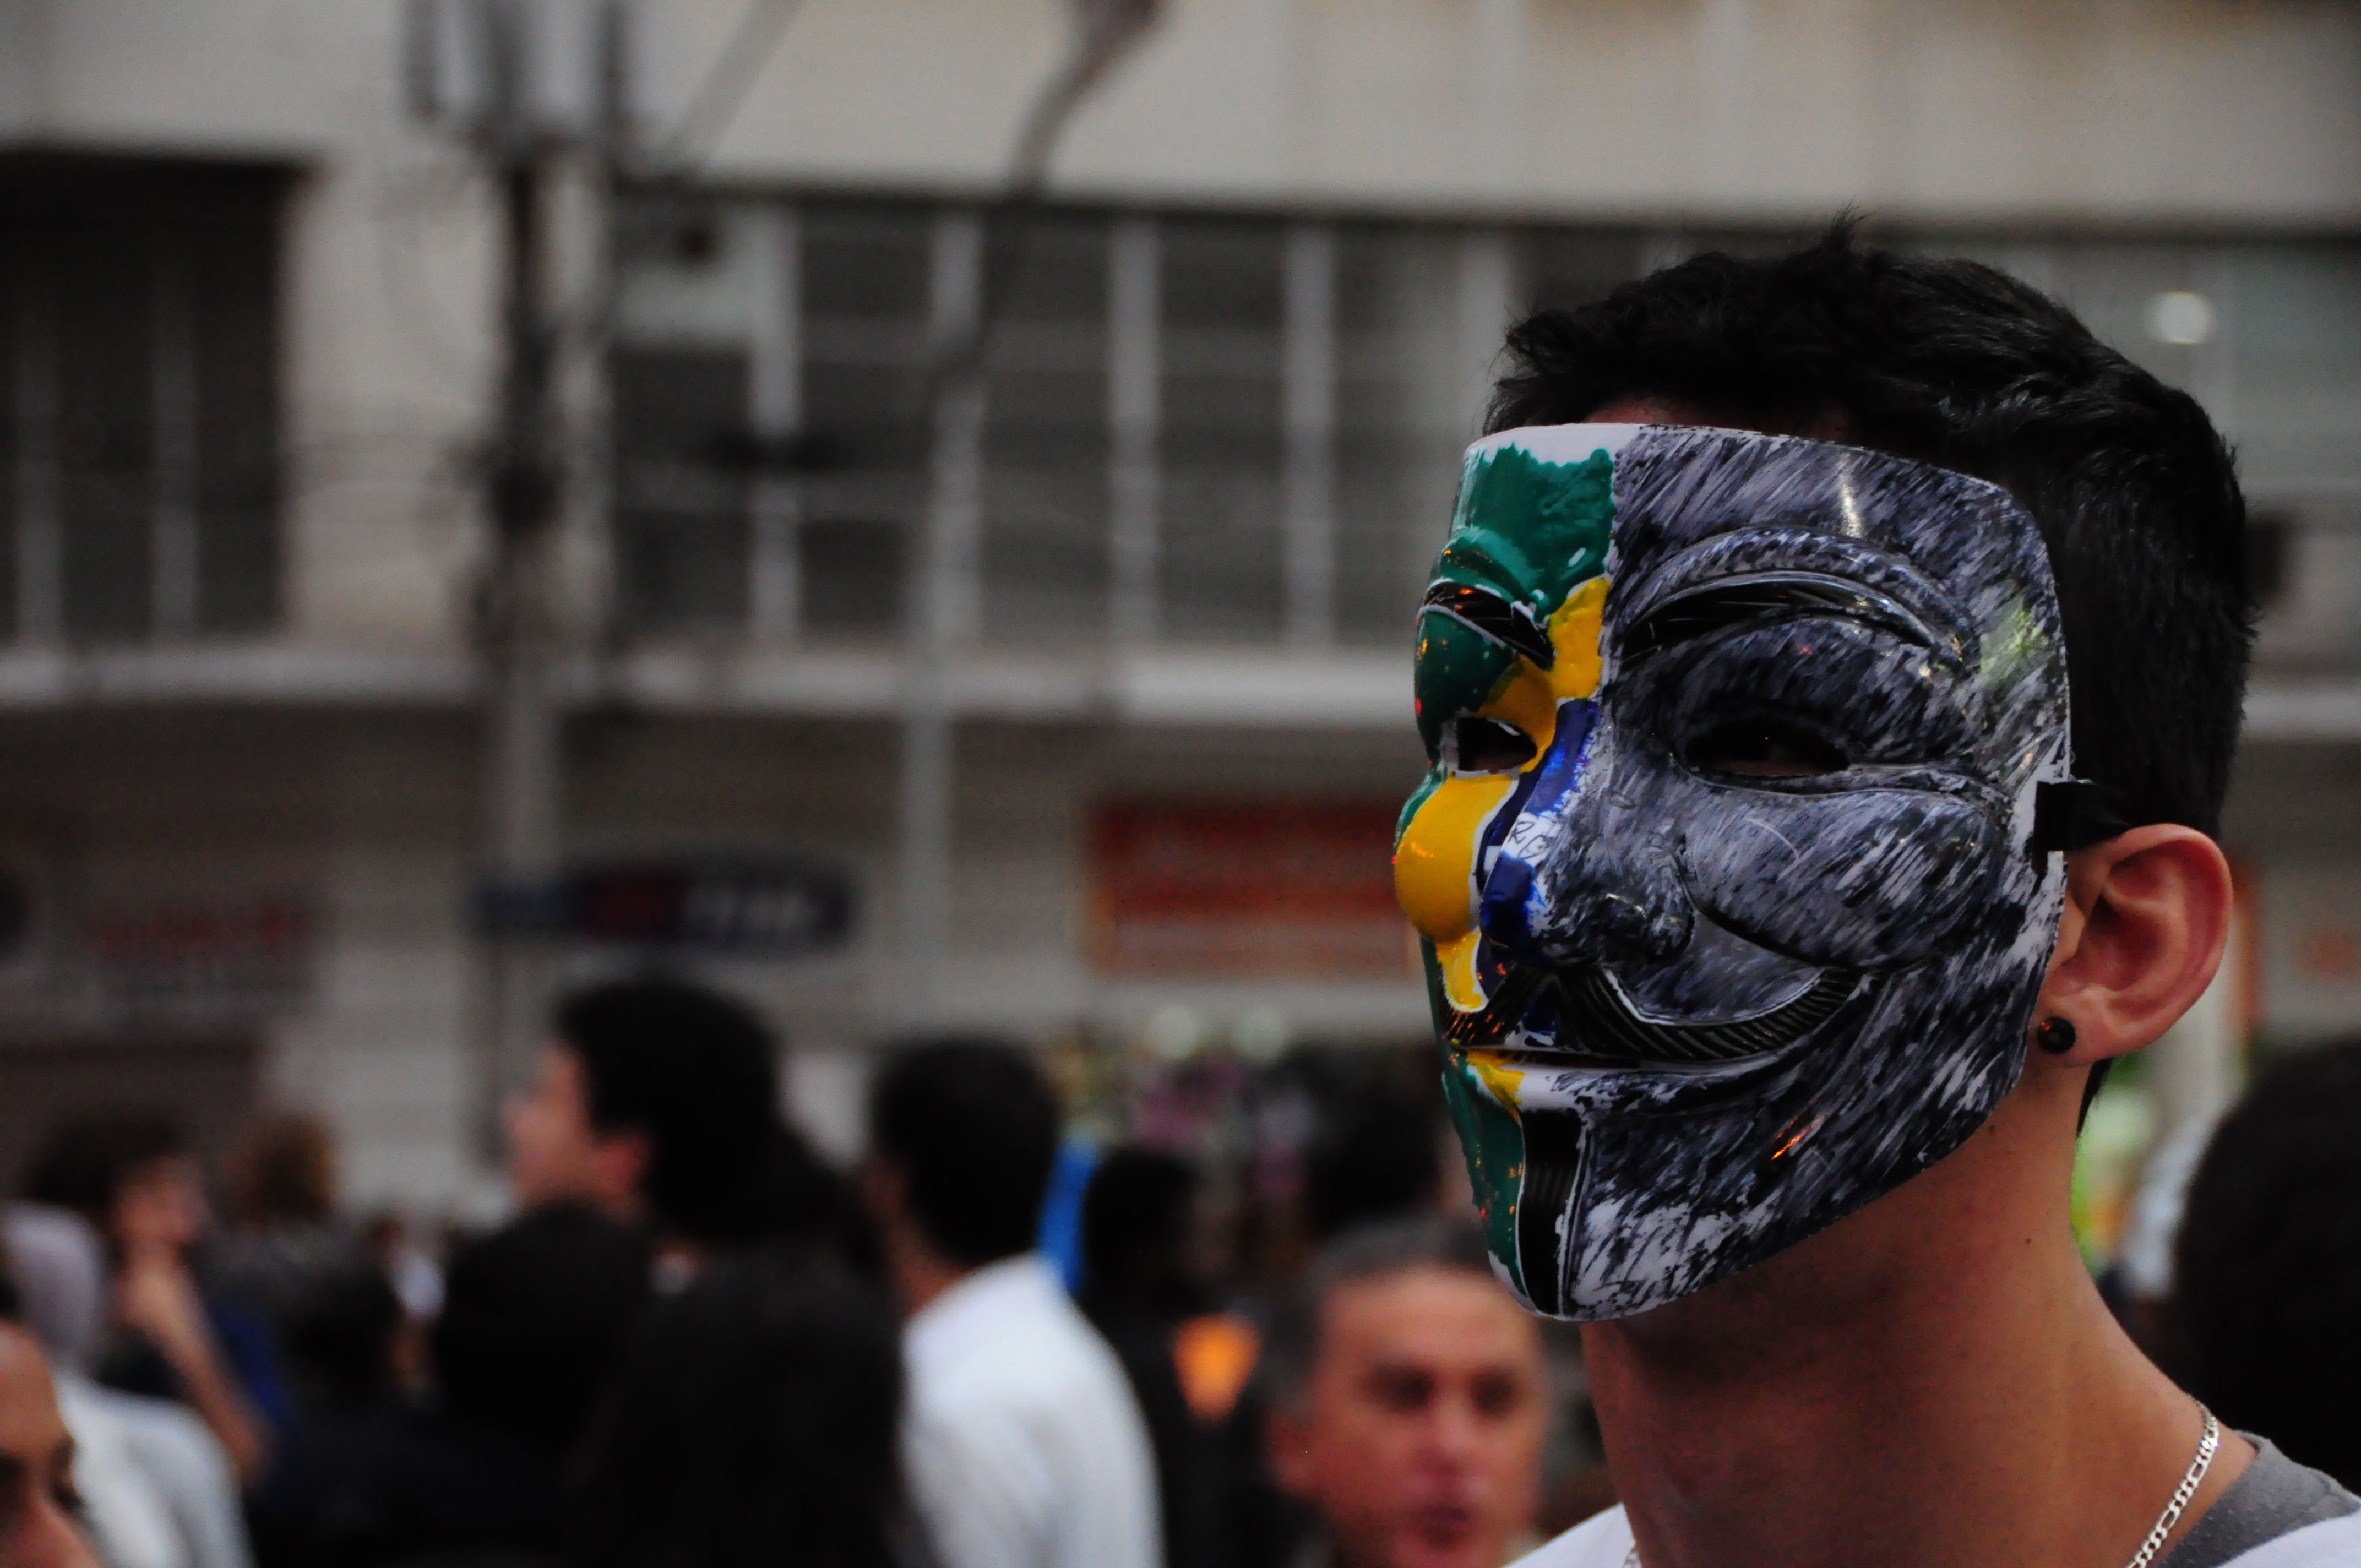 Manifestante utiliza máscara com metade da bandeira do Brasil no terceiro dia de protestos